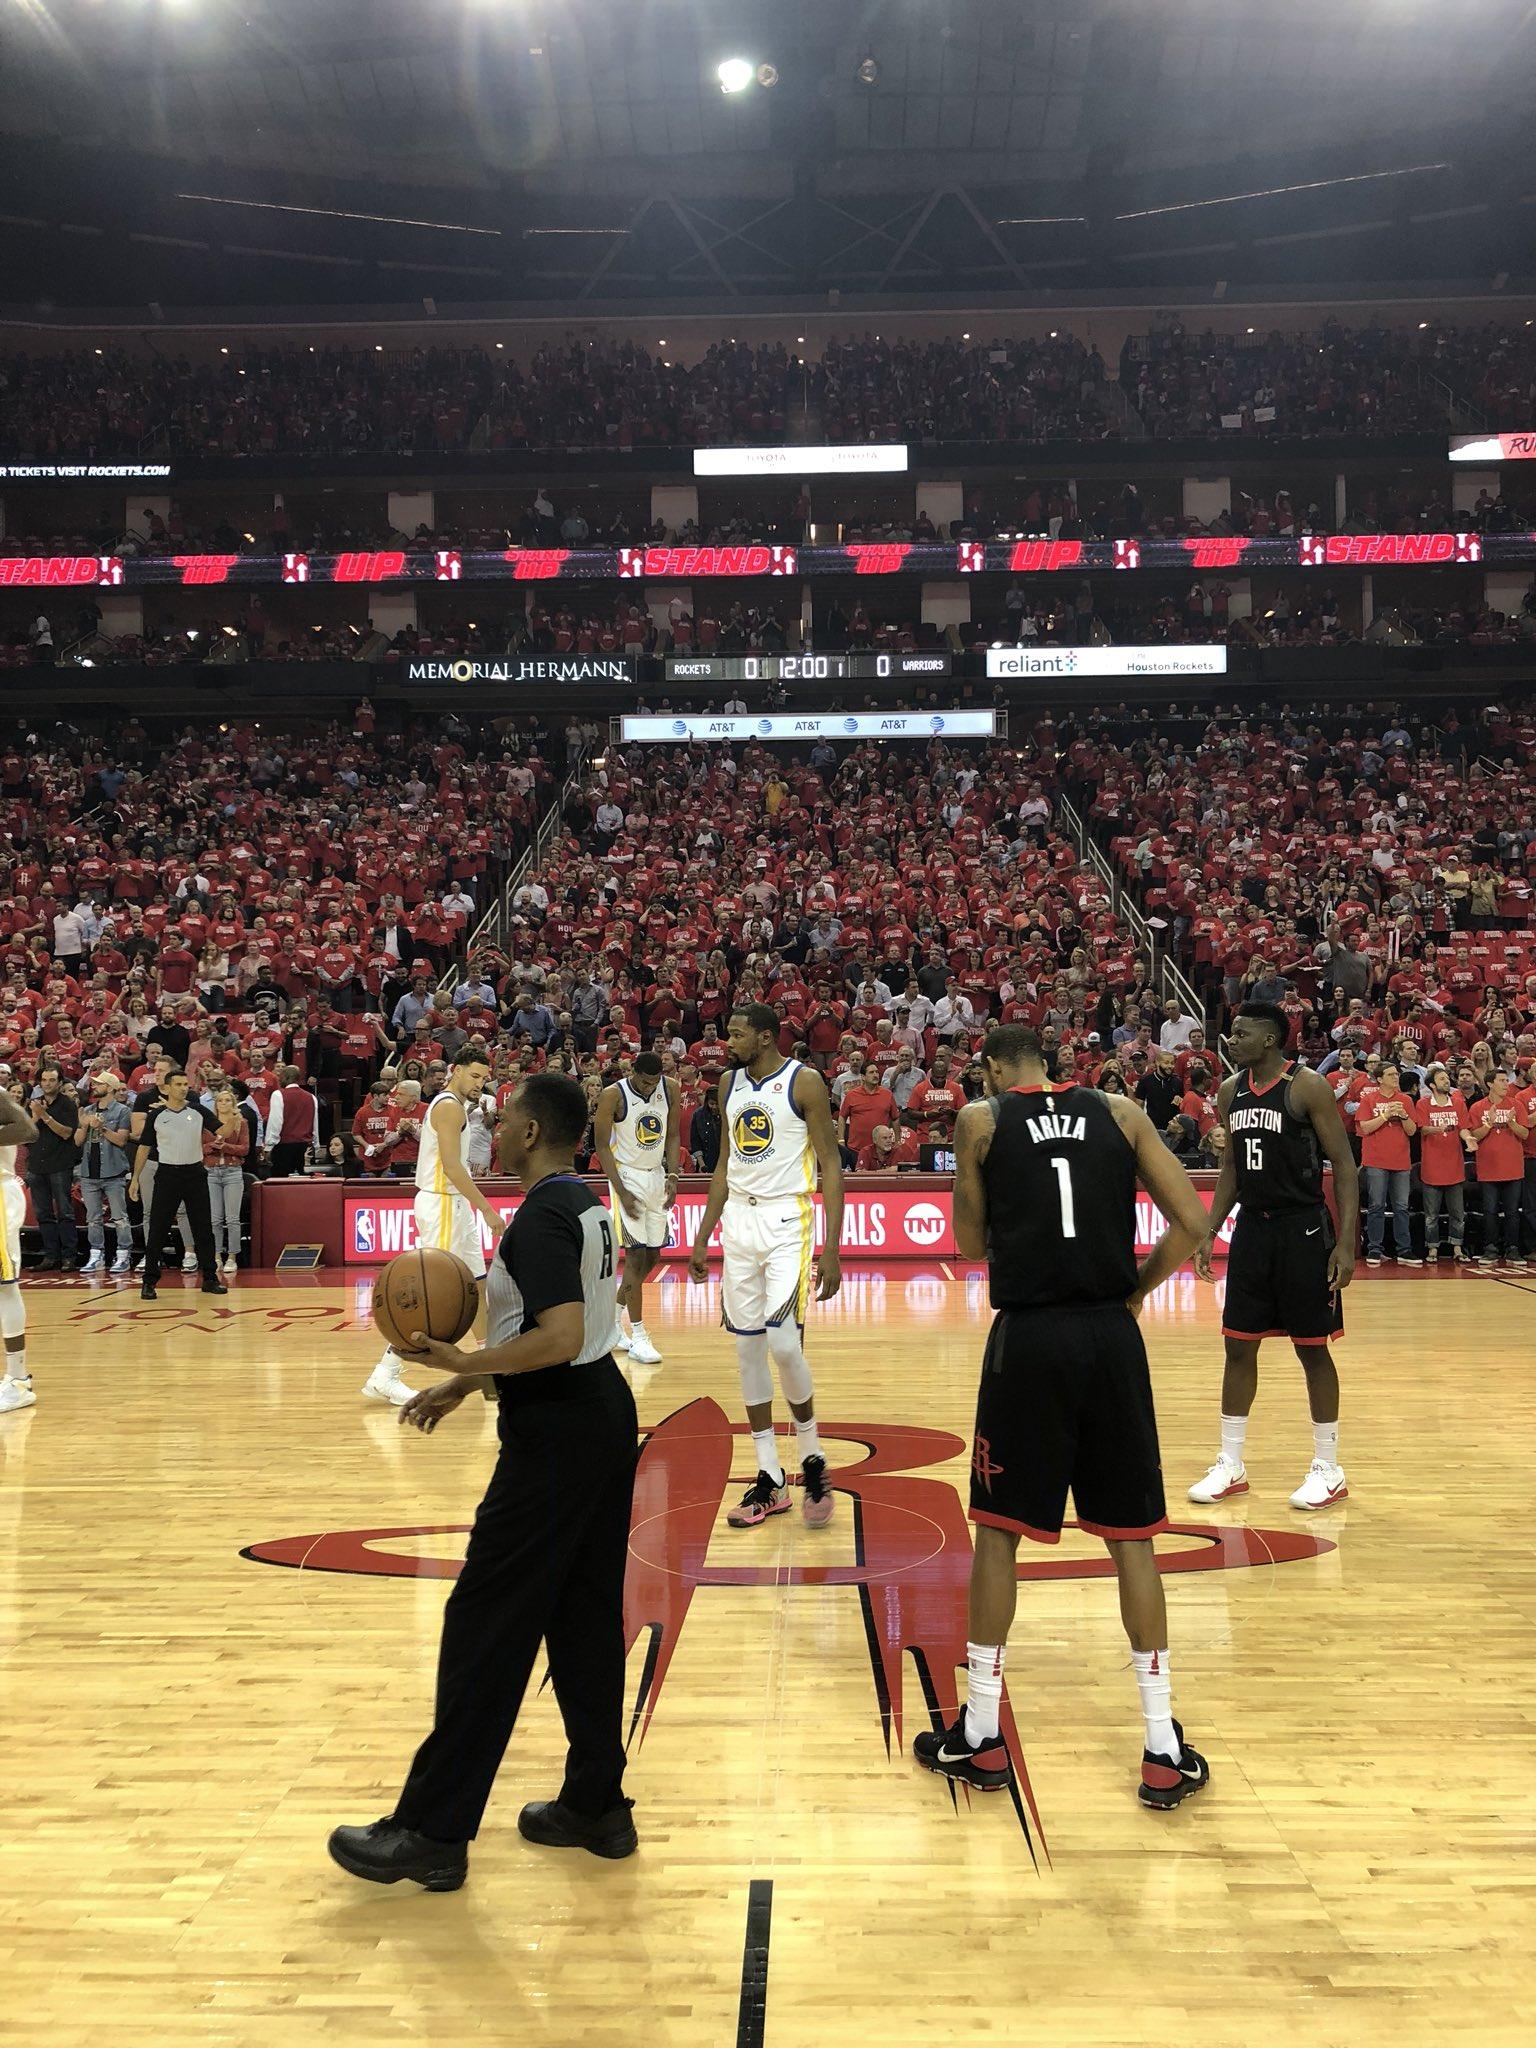 Game 5 starts NOW!  ��: @NBAonTNT https://t.co/S91AJNpP8u